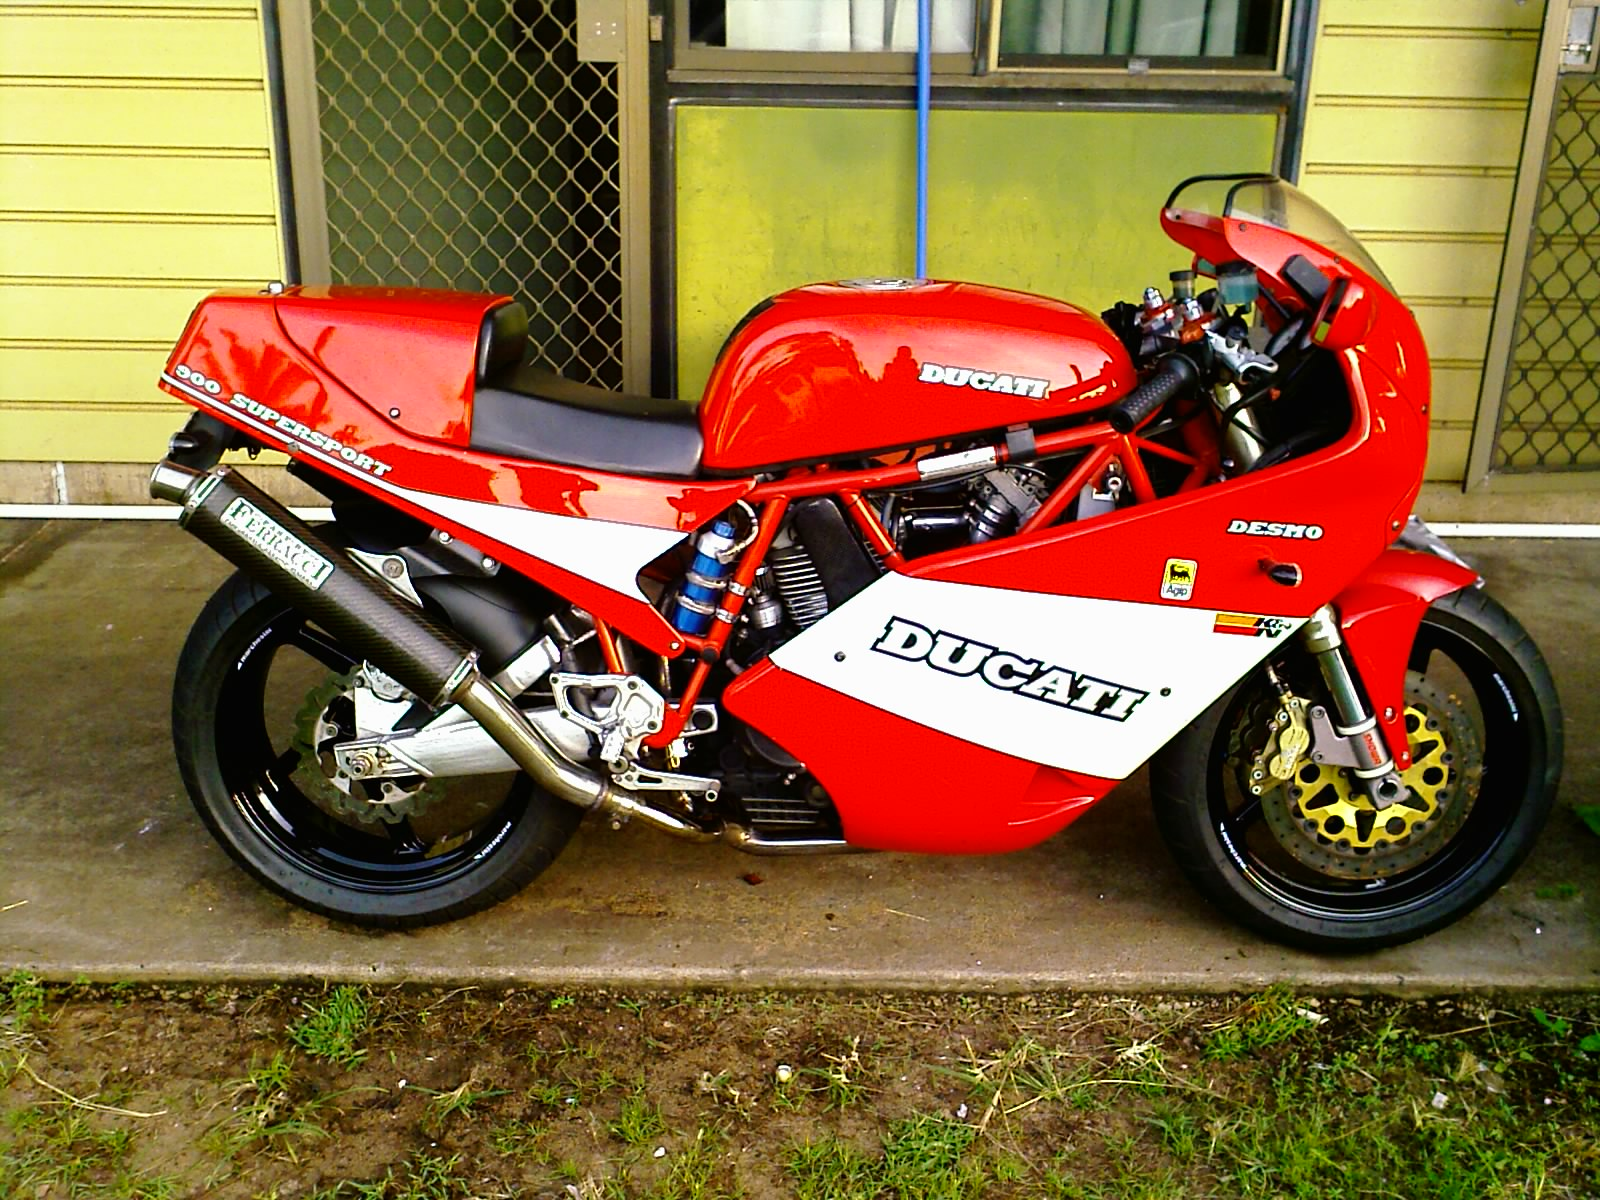 Ducati Ie For Sale Australia